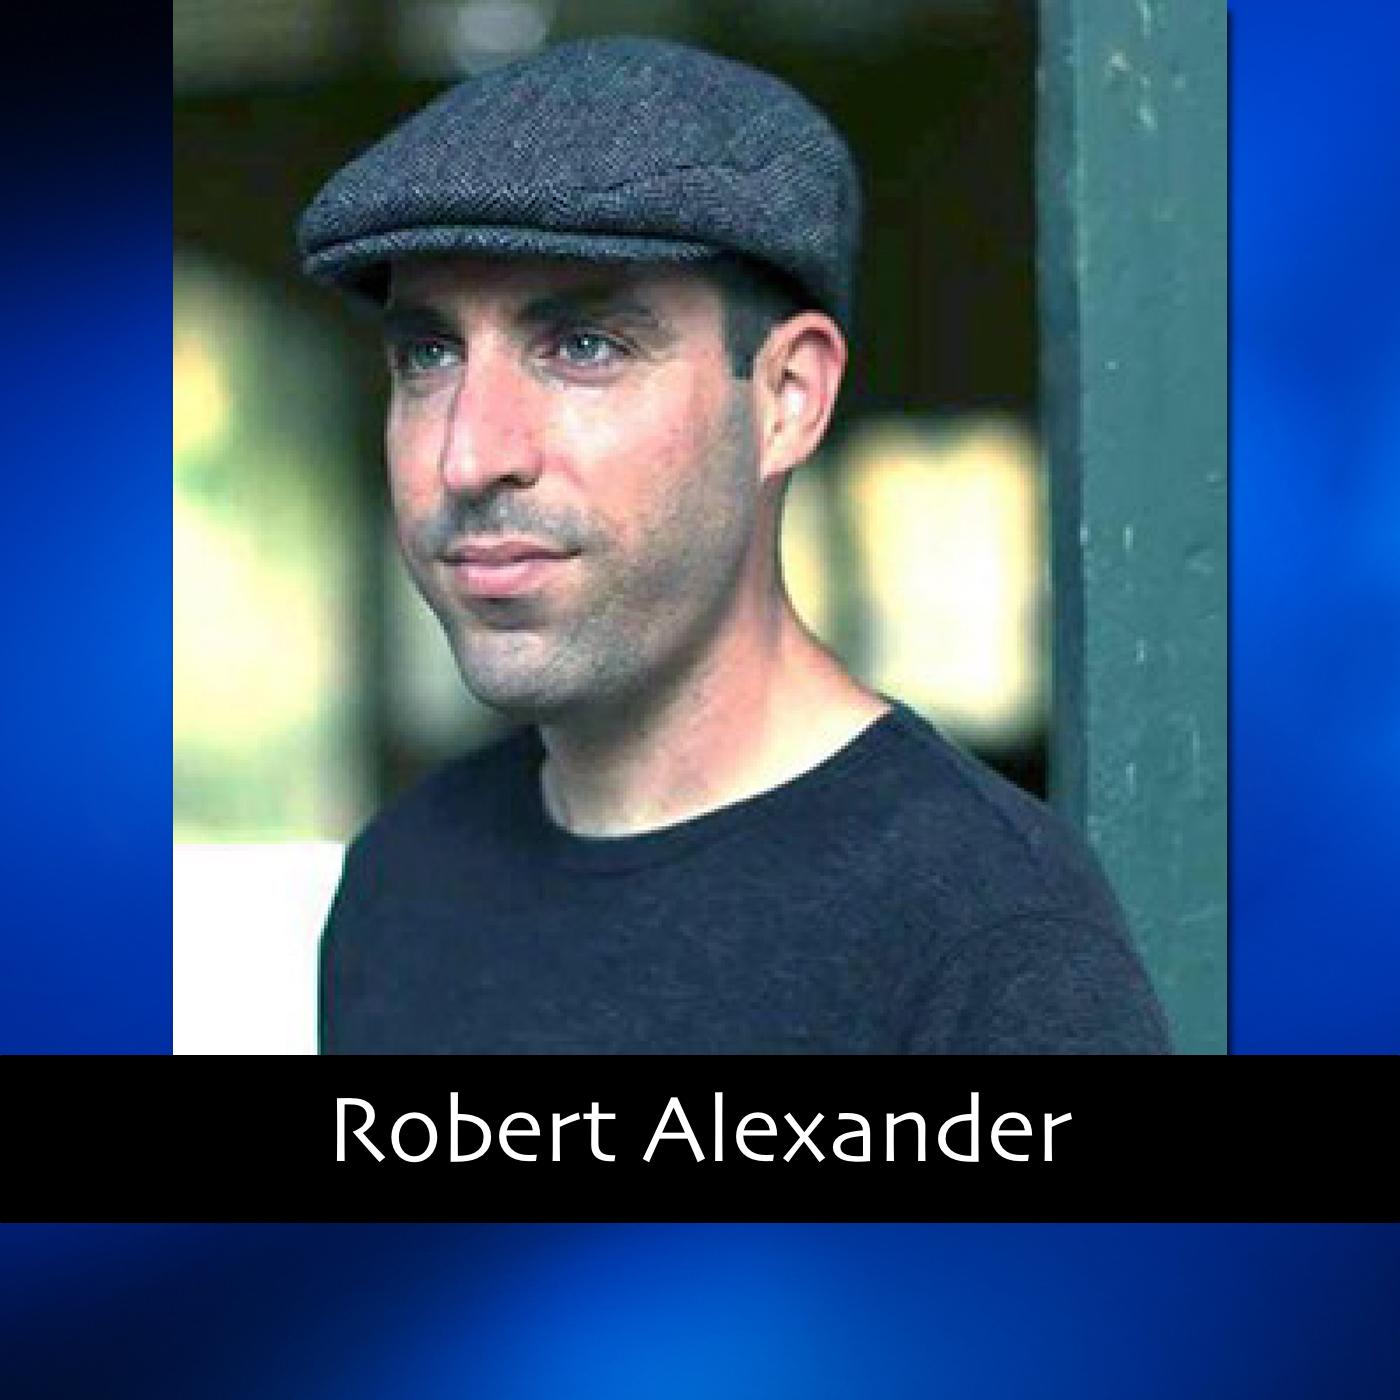 Robert Alexander Thumb.jpg